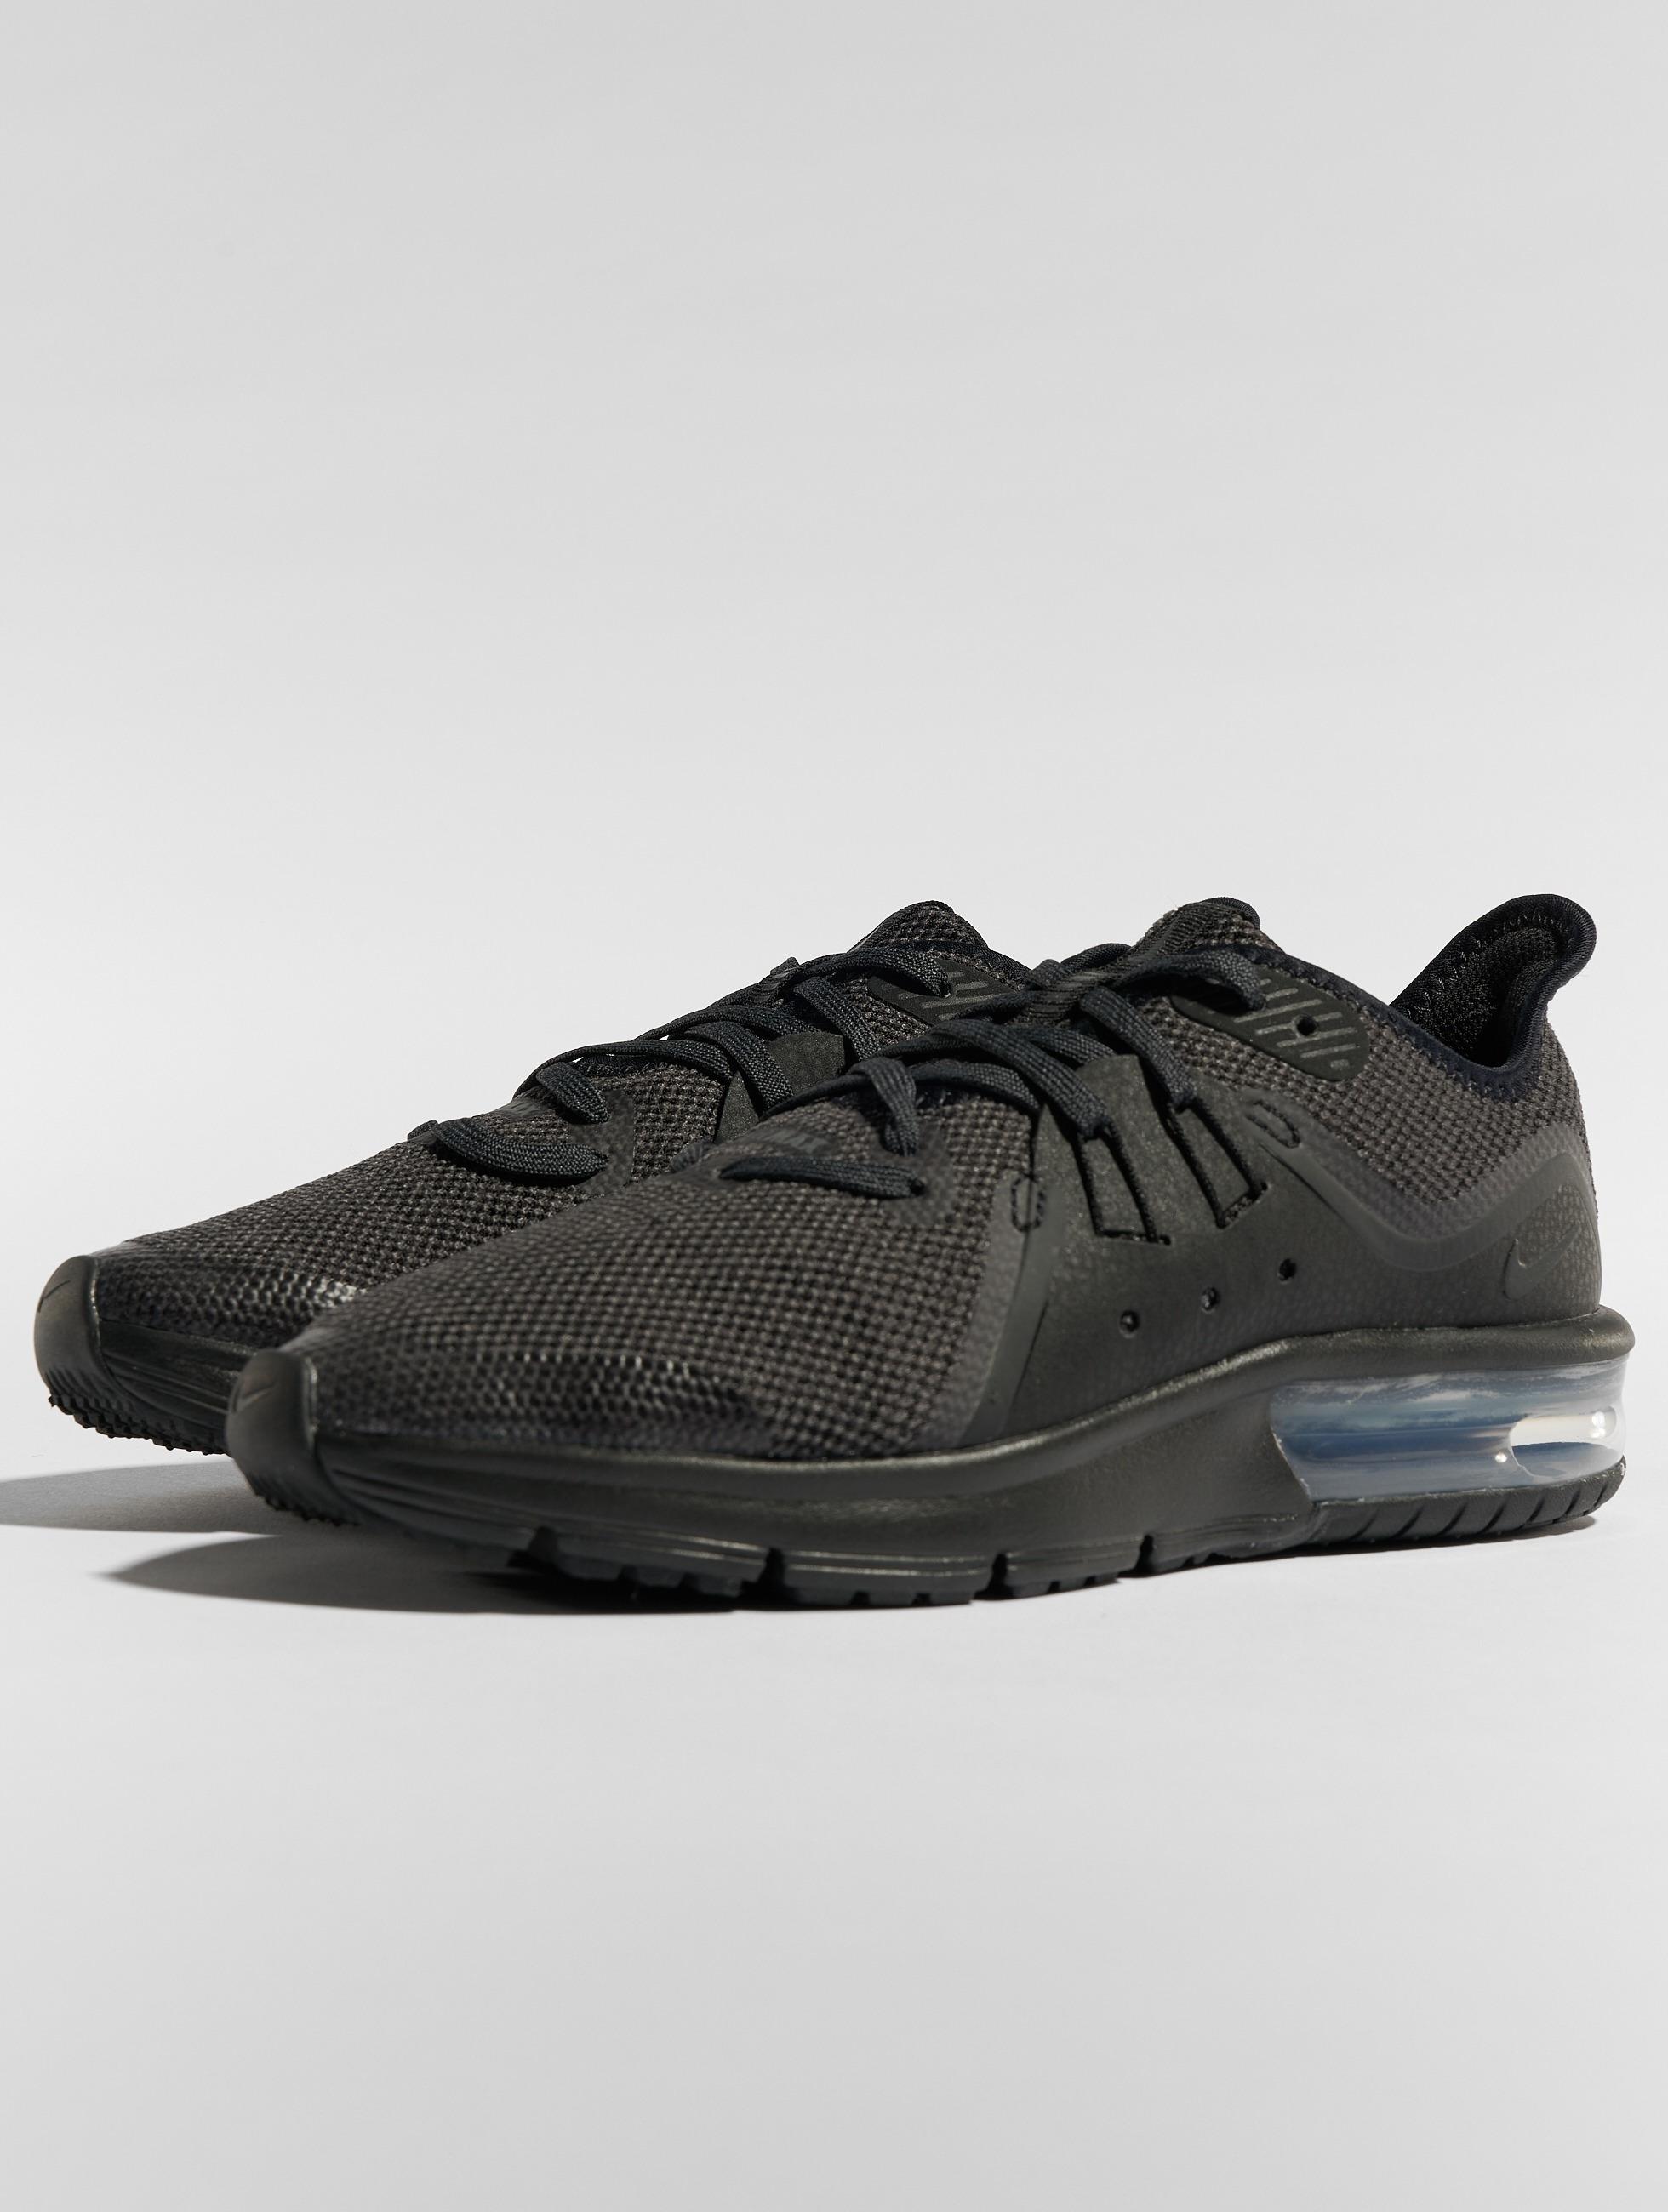 fcda057c0b4 Nike schoen / sneaker Air Max Sequent 3 in zwart 545160